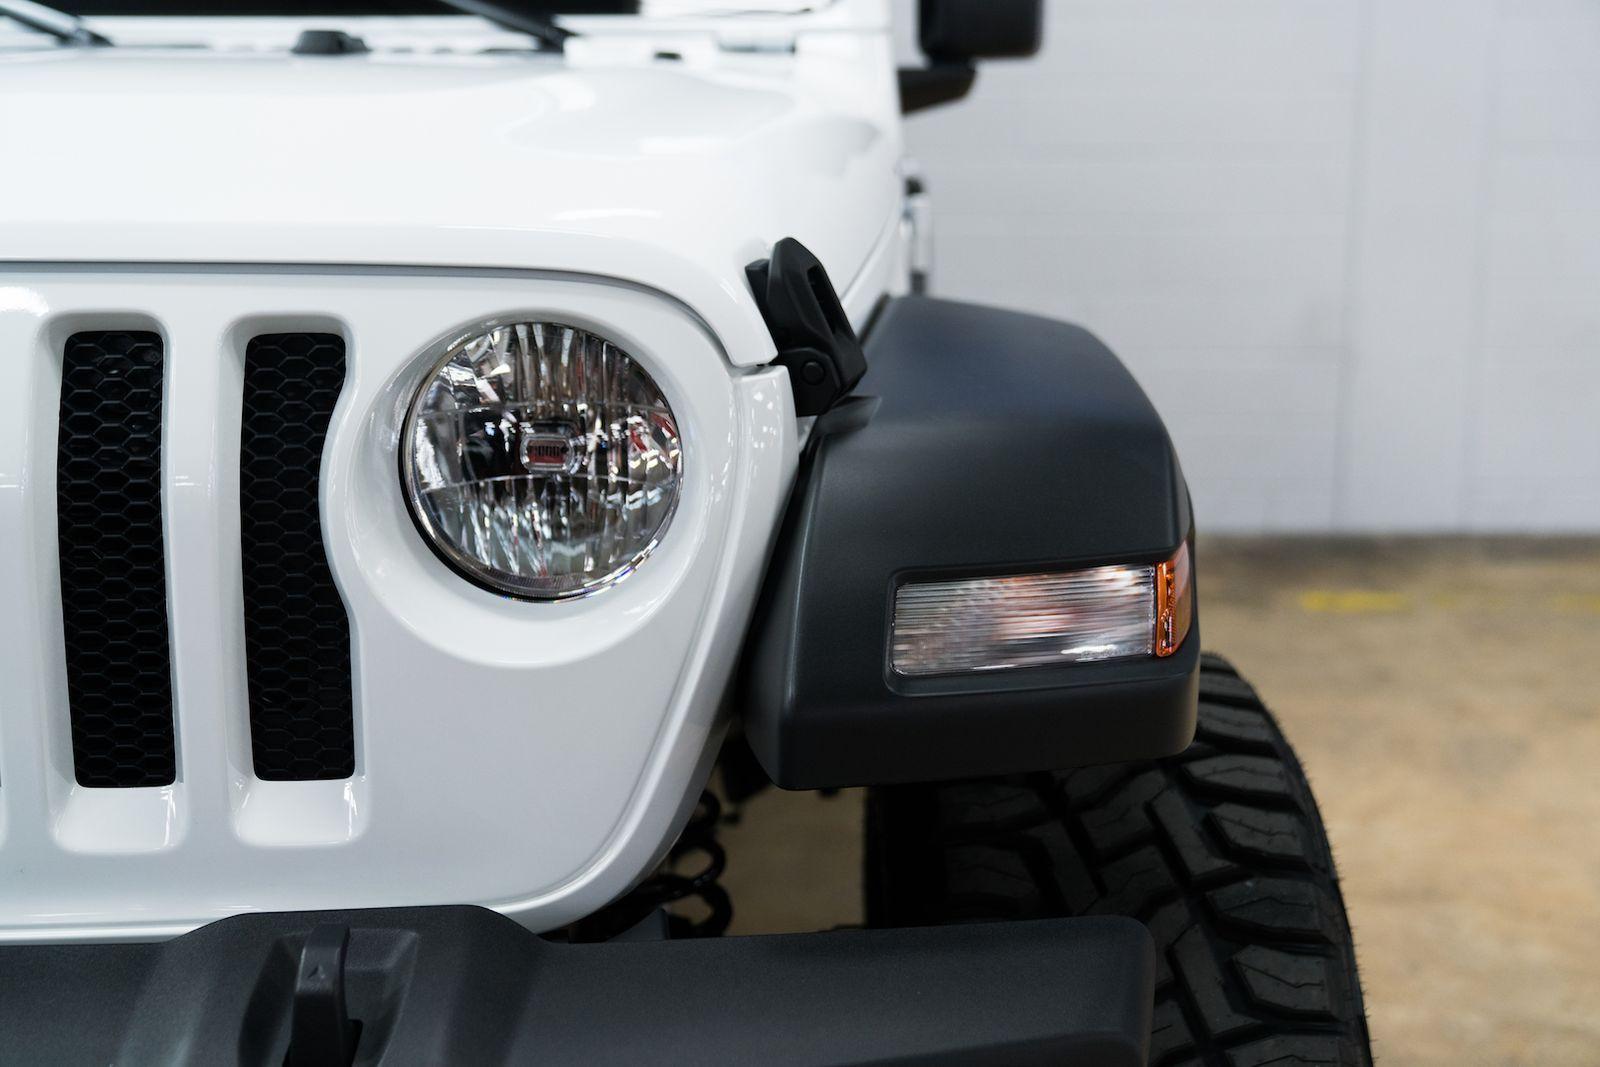 Great Jeep Wrangler Unlimited Sport S Custom Mopar 2 5″ Lift w/FOX Shocks   35″ Toyo Tires  20″ Asanti Wheels  N-Fab Steps  2019